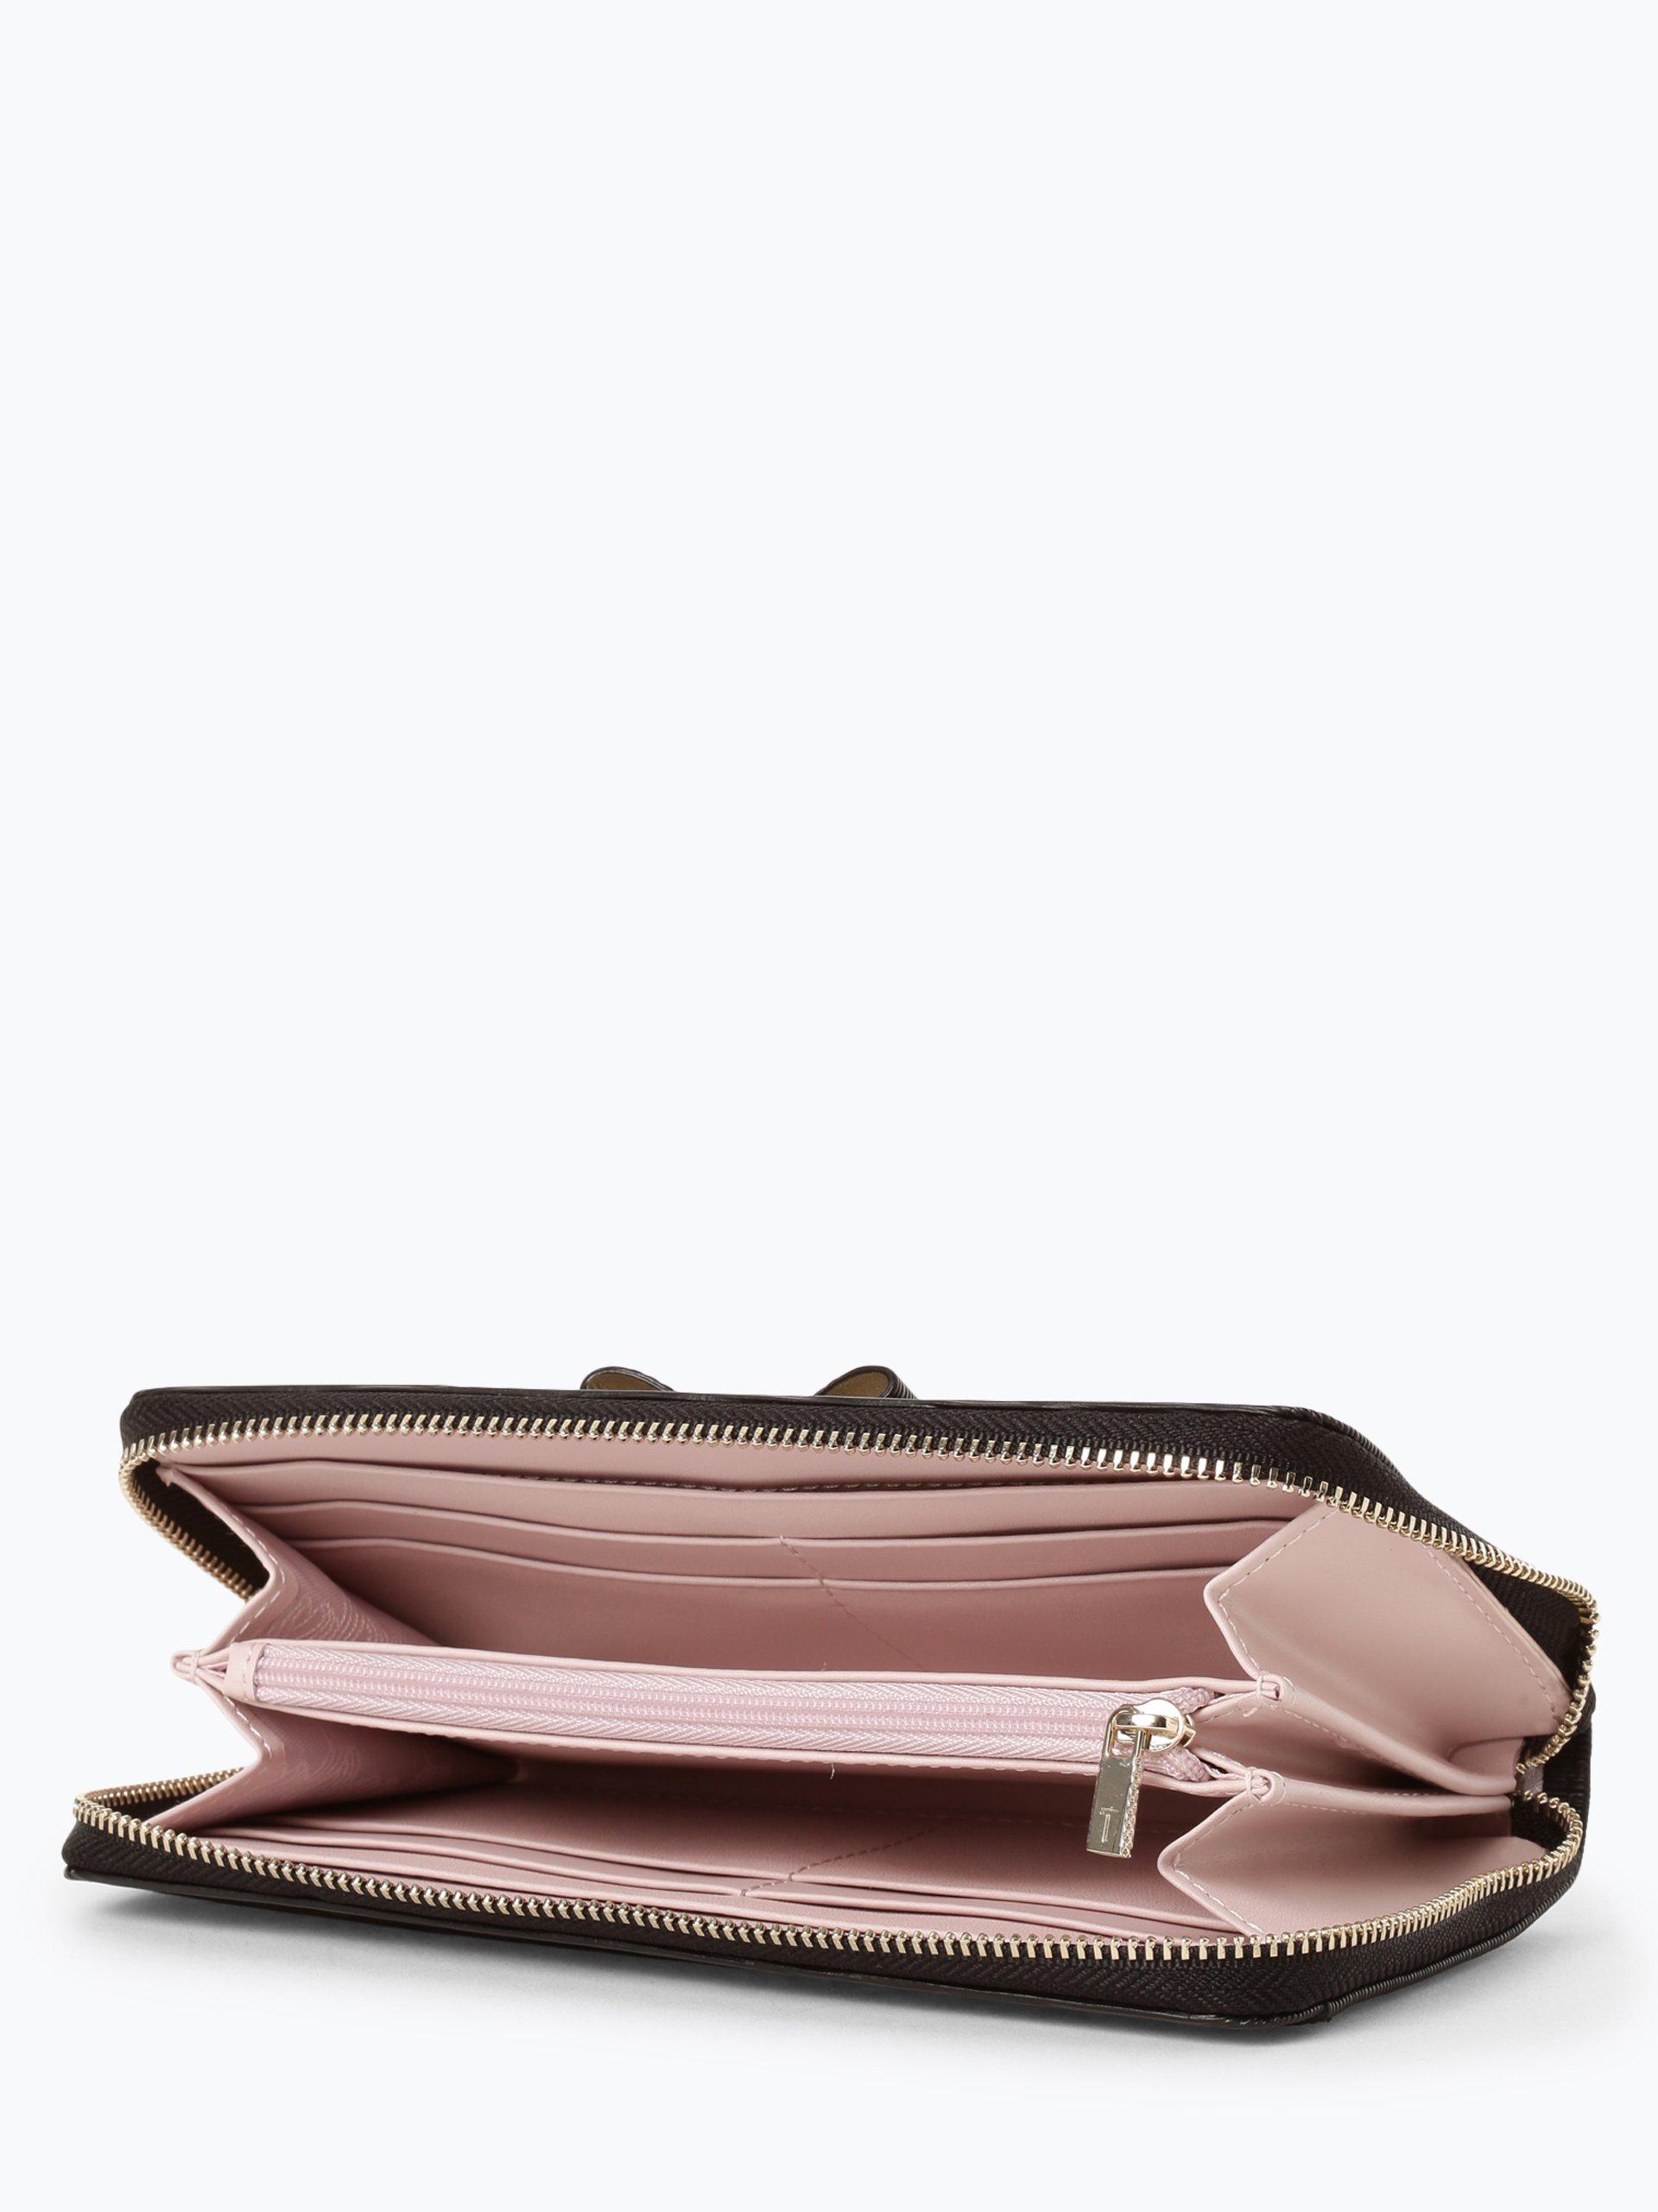 Ted Baker Damen Geldbörse aus Leder - Peony